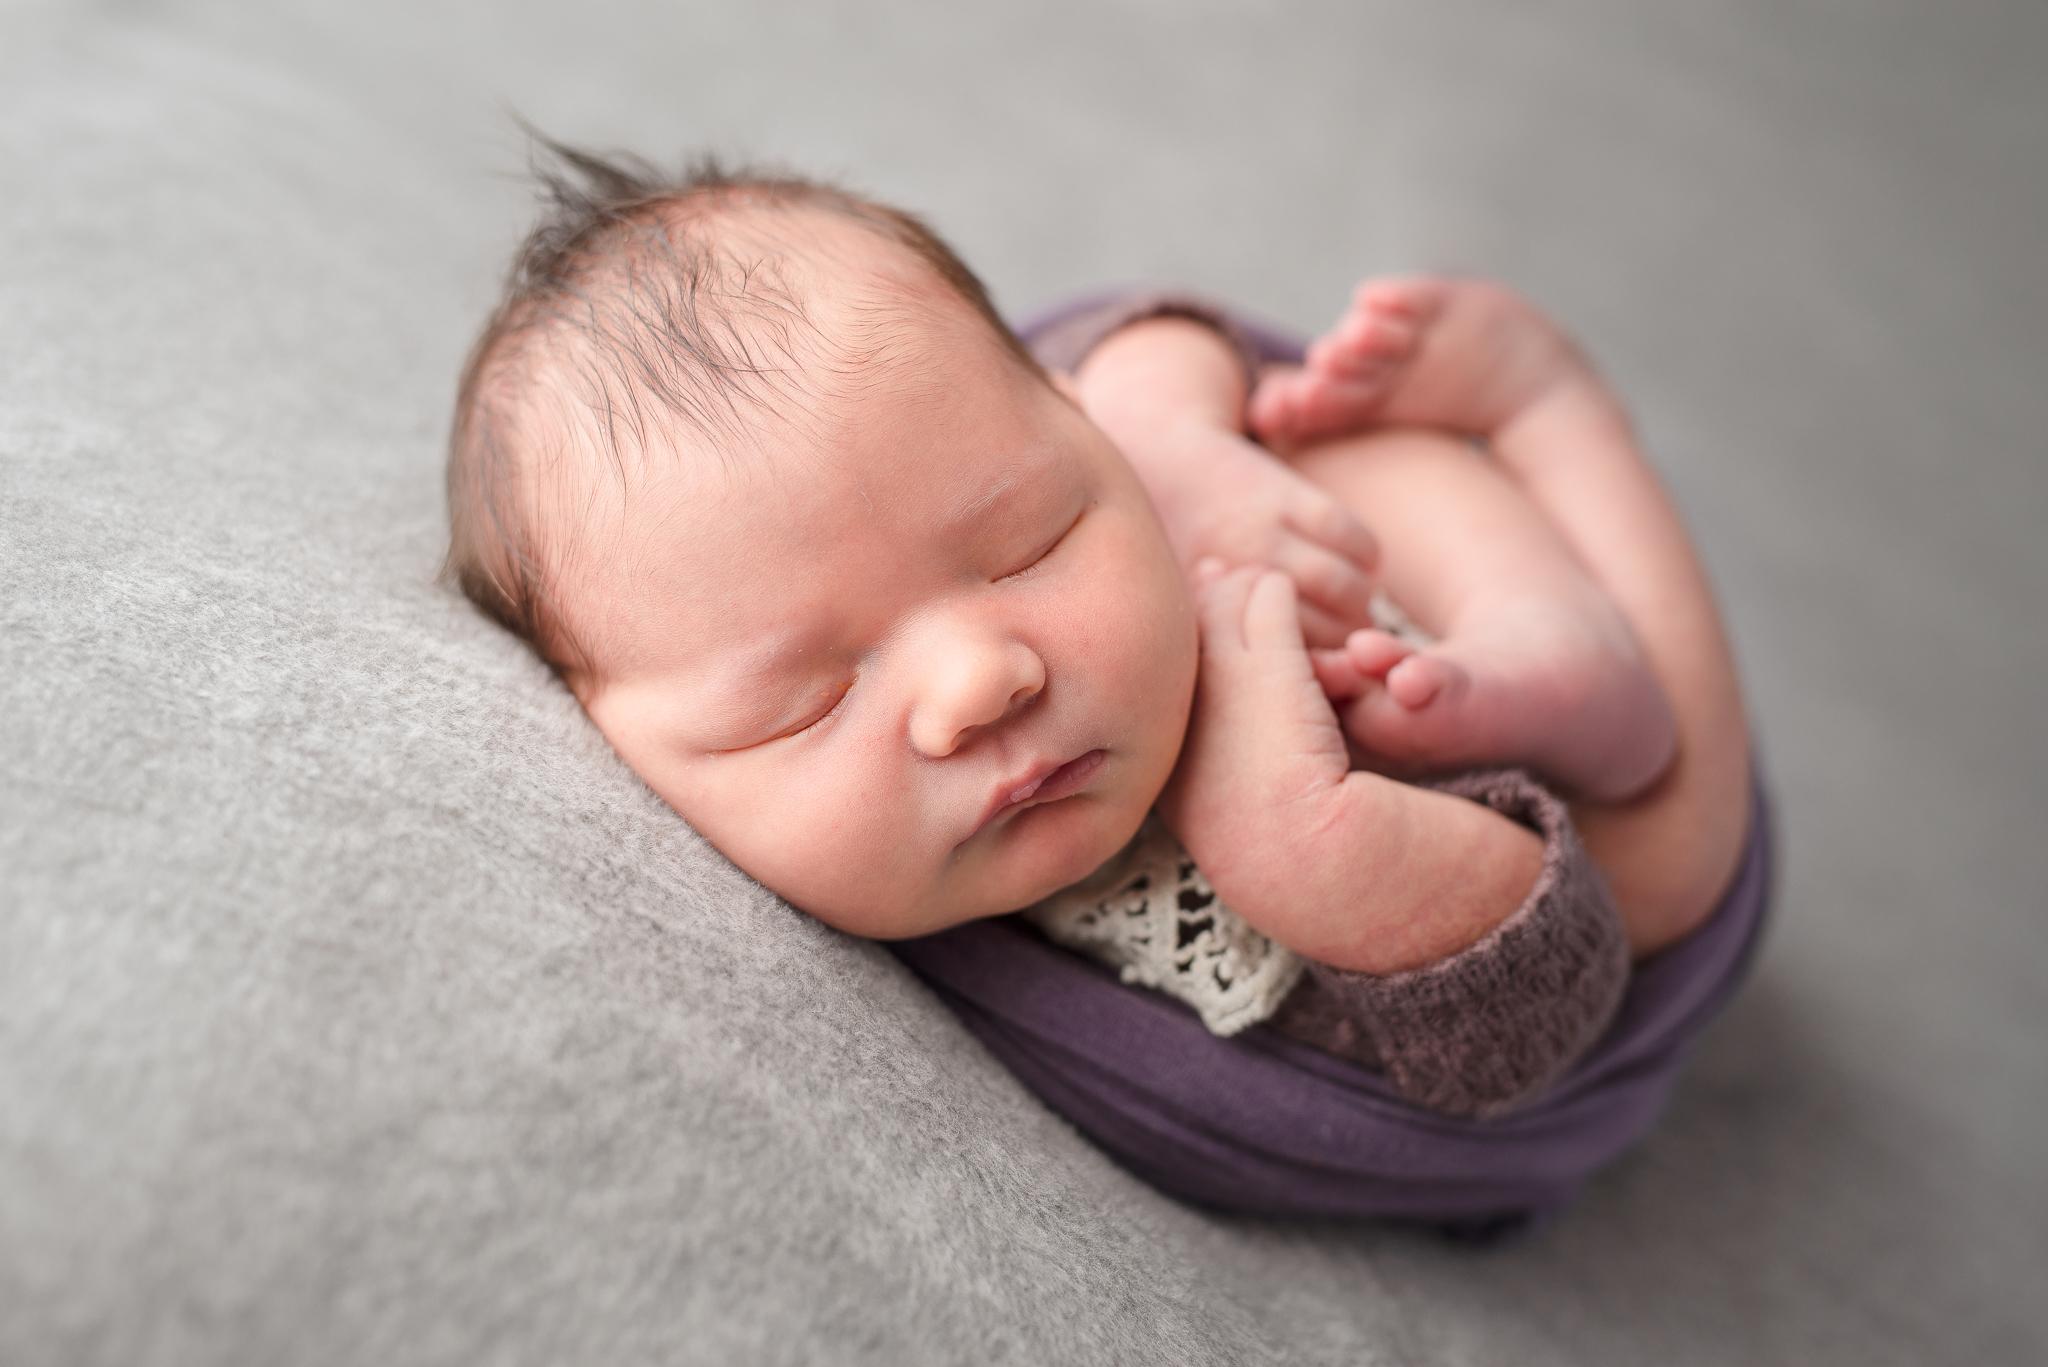 Newborn56NaomiLuciennePhotography102018-2-Edit.jpg